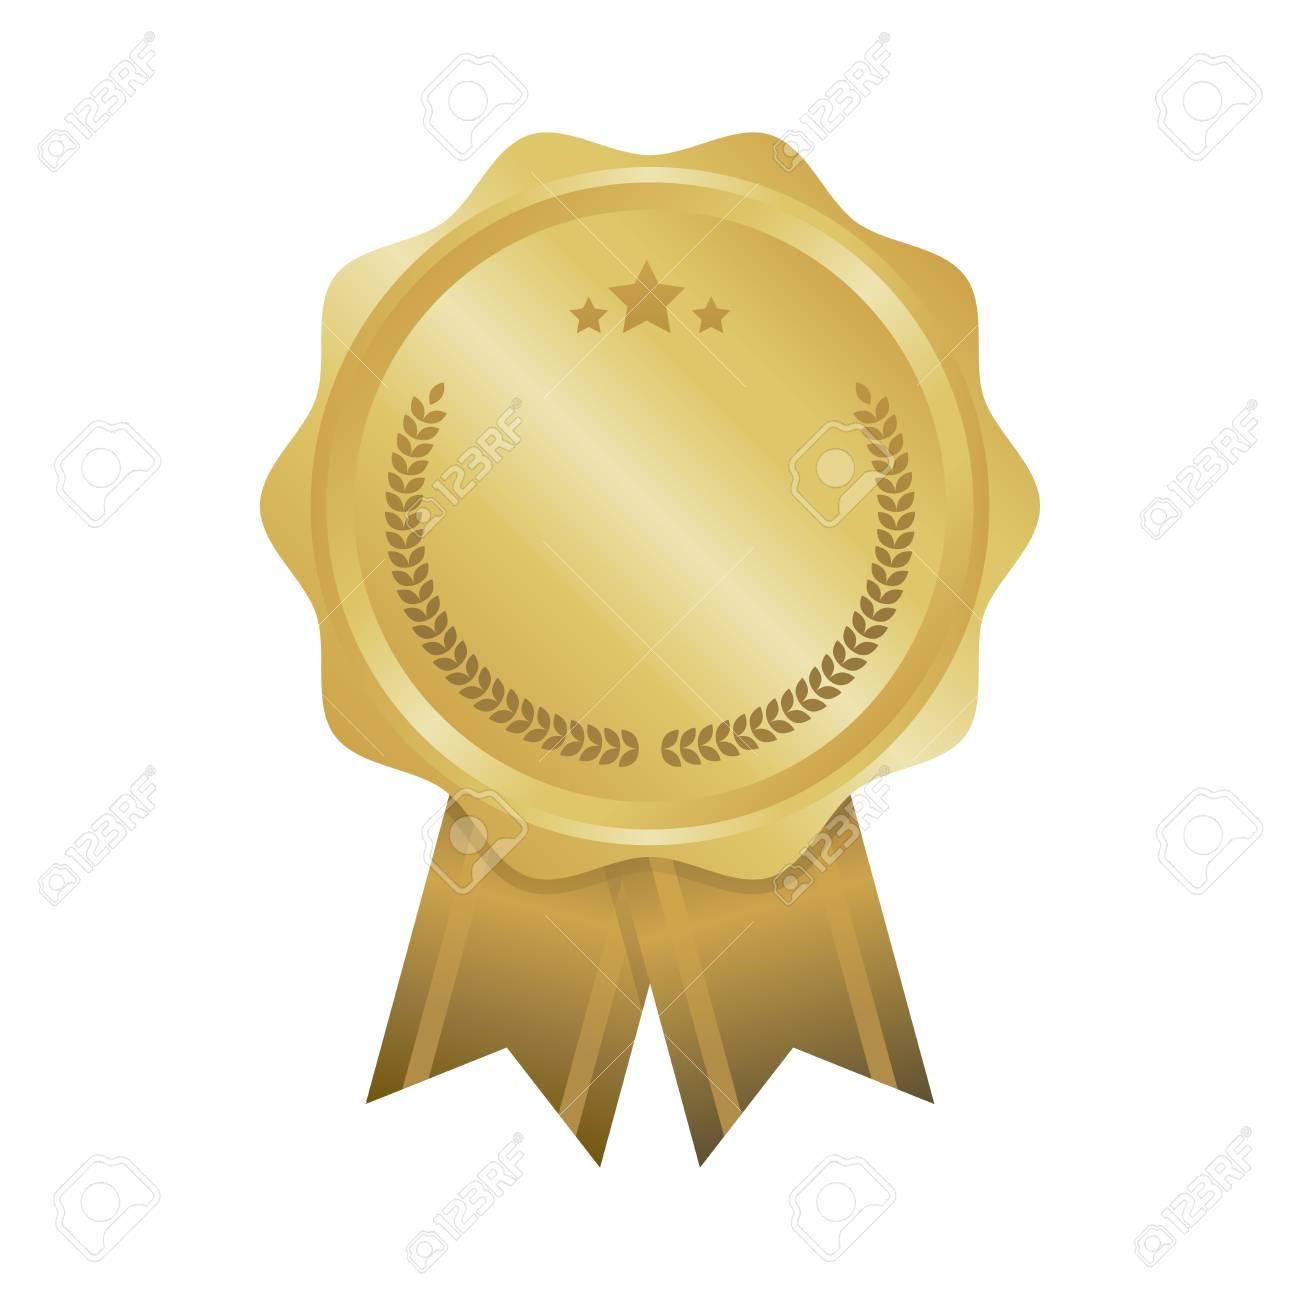 Modern gold circle metal badge, label and design elements. Vector illustration. - 69994028